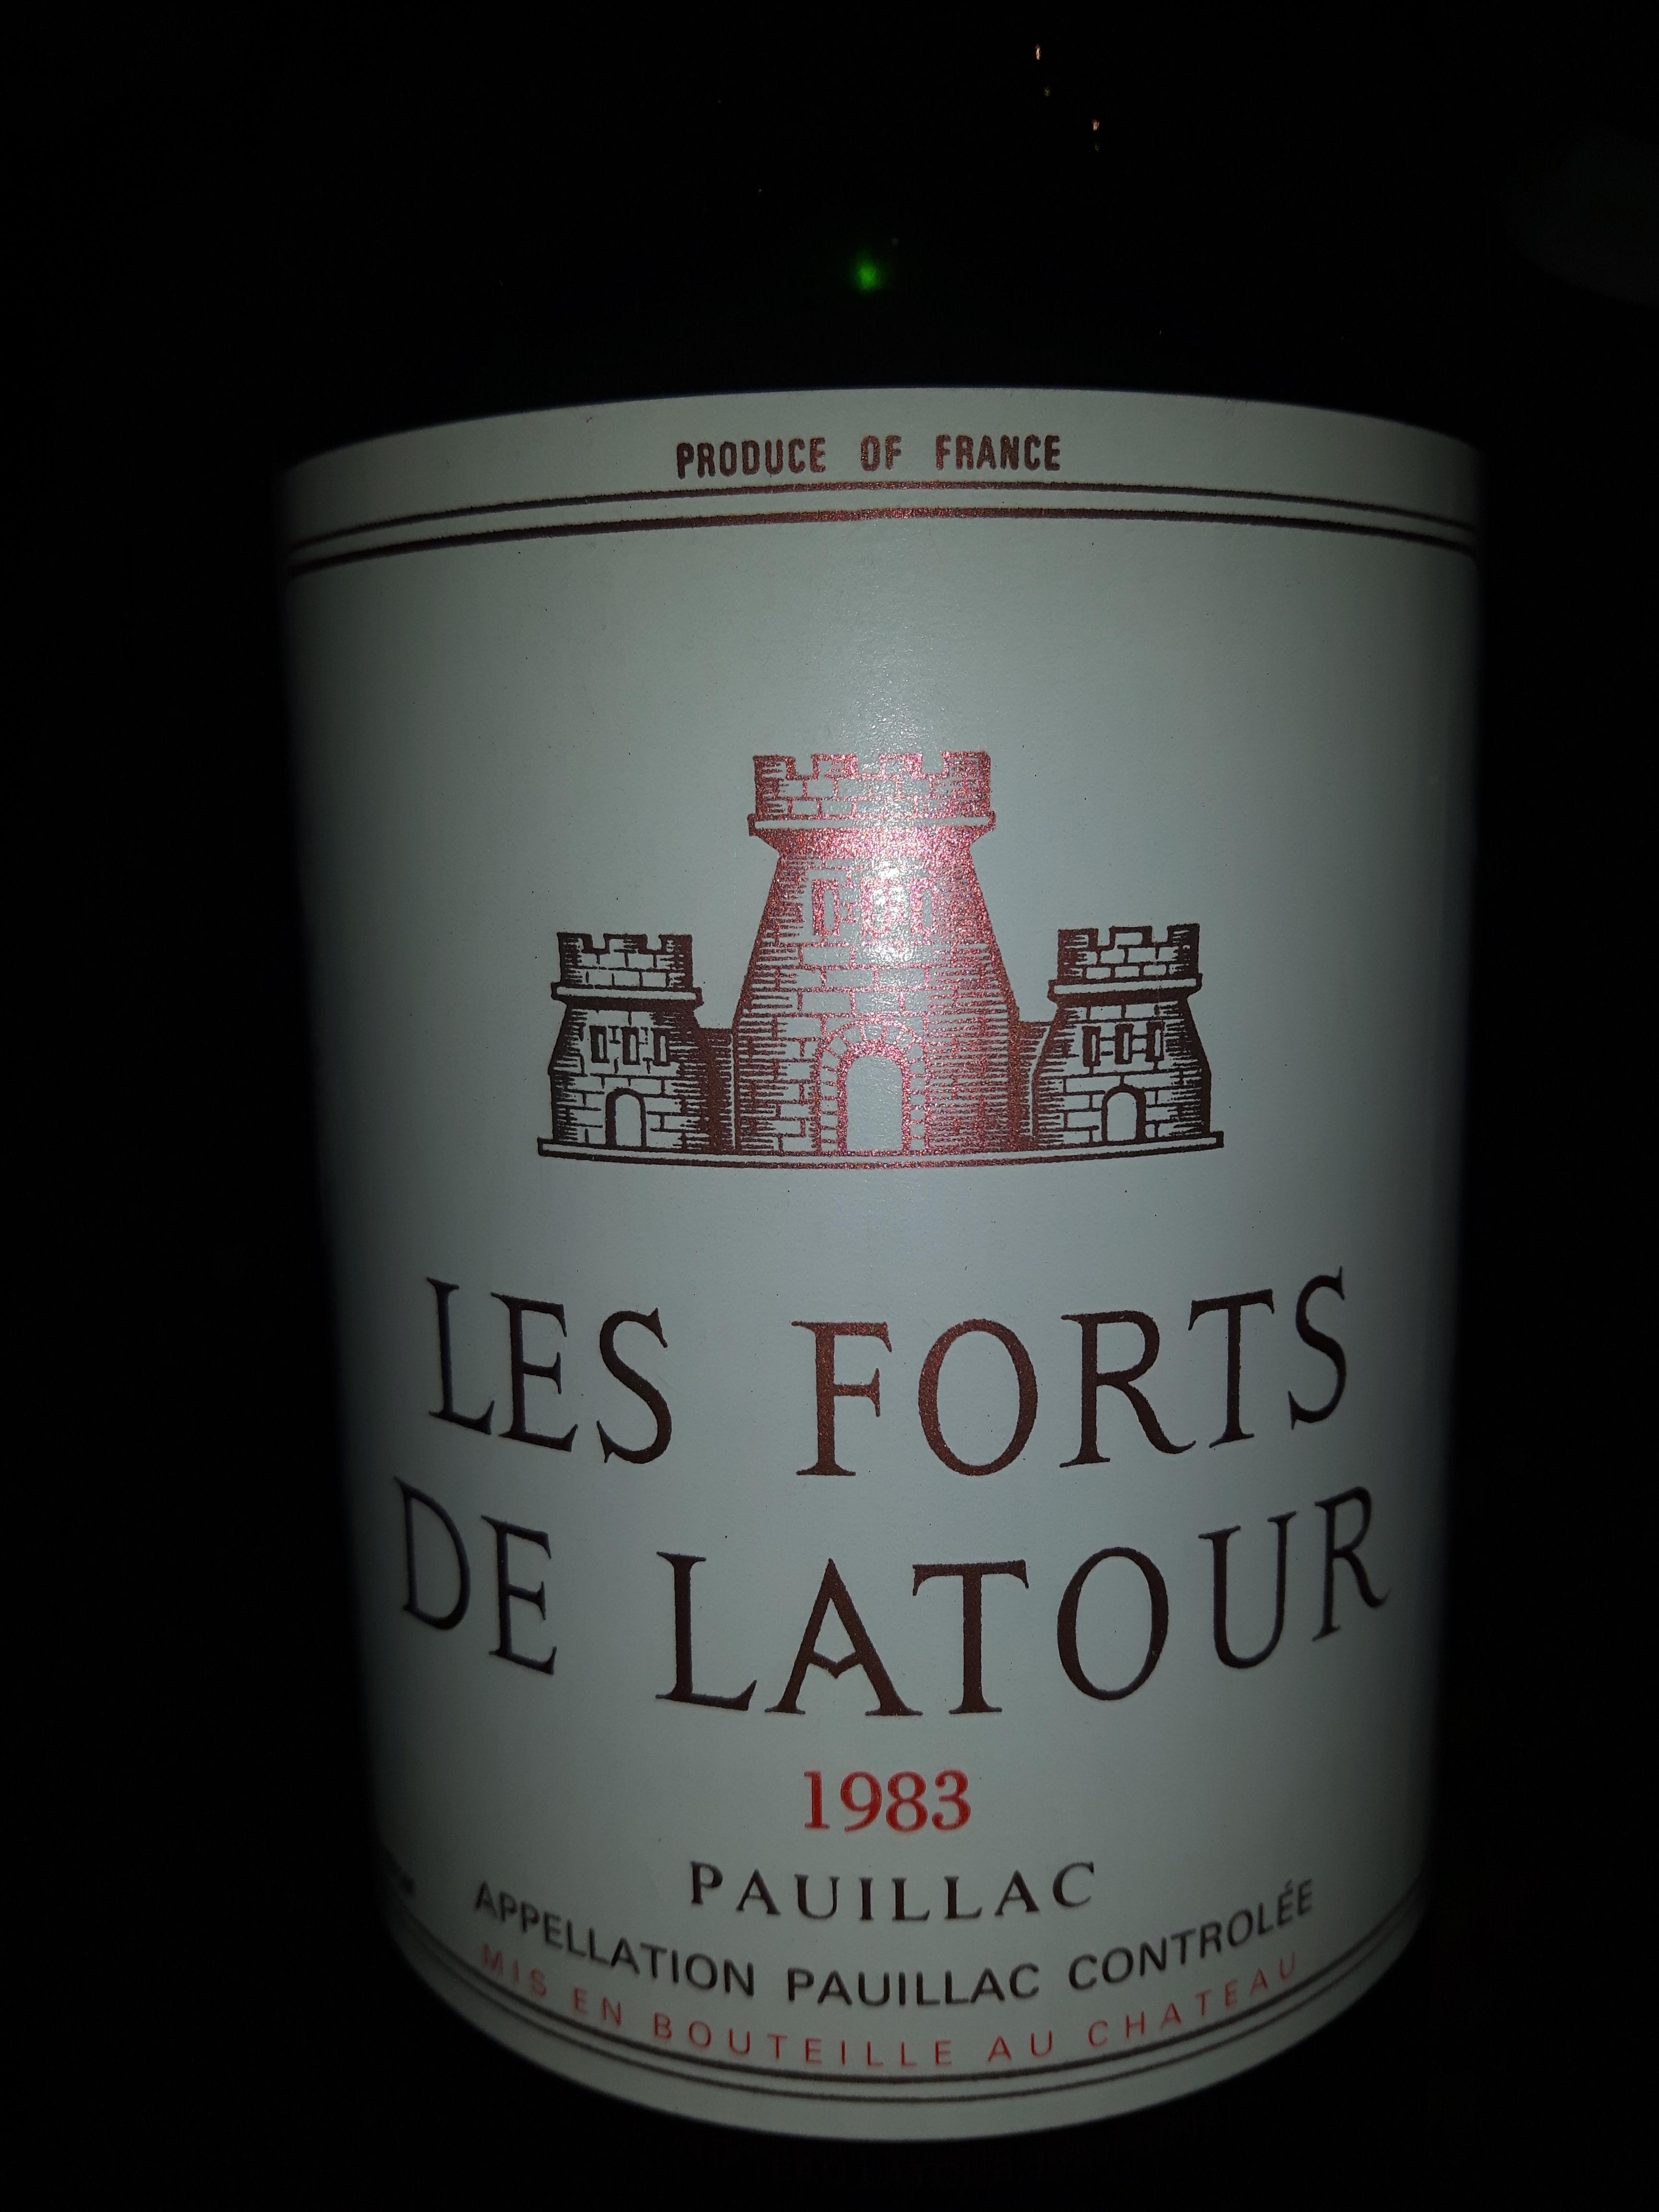 Latour Pauillac 1983